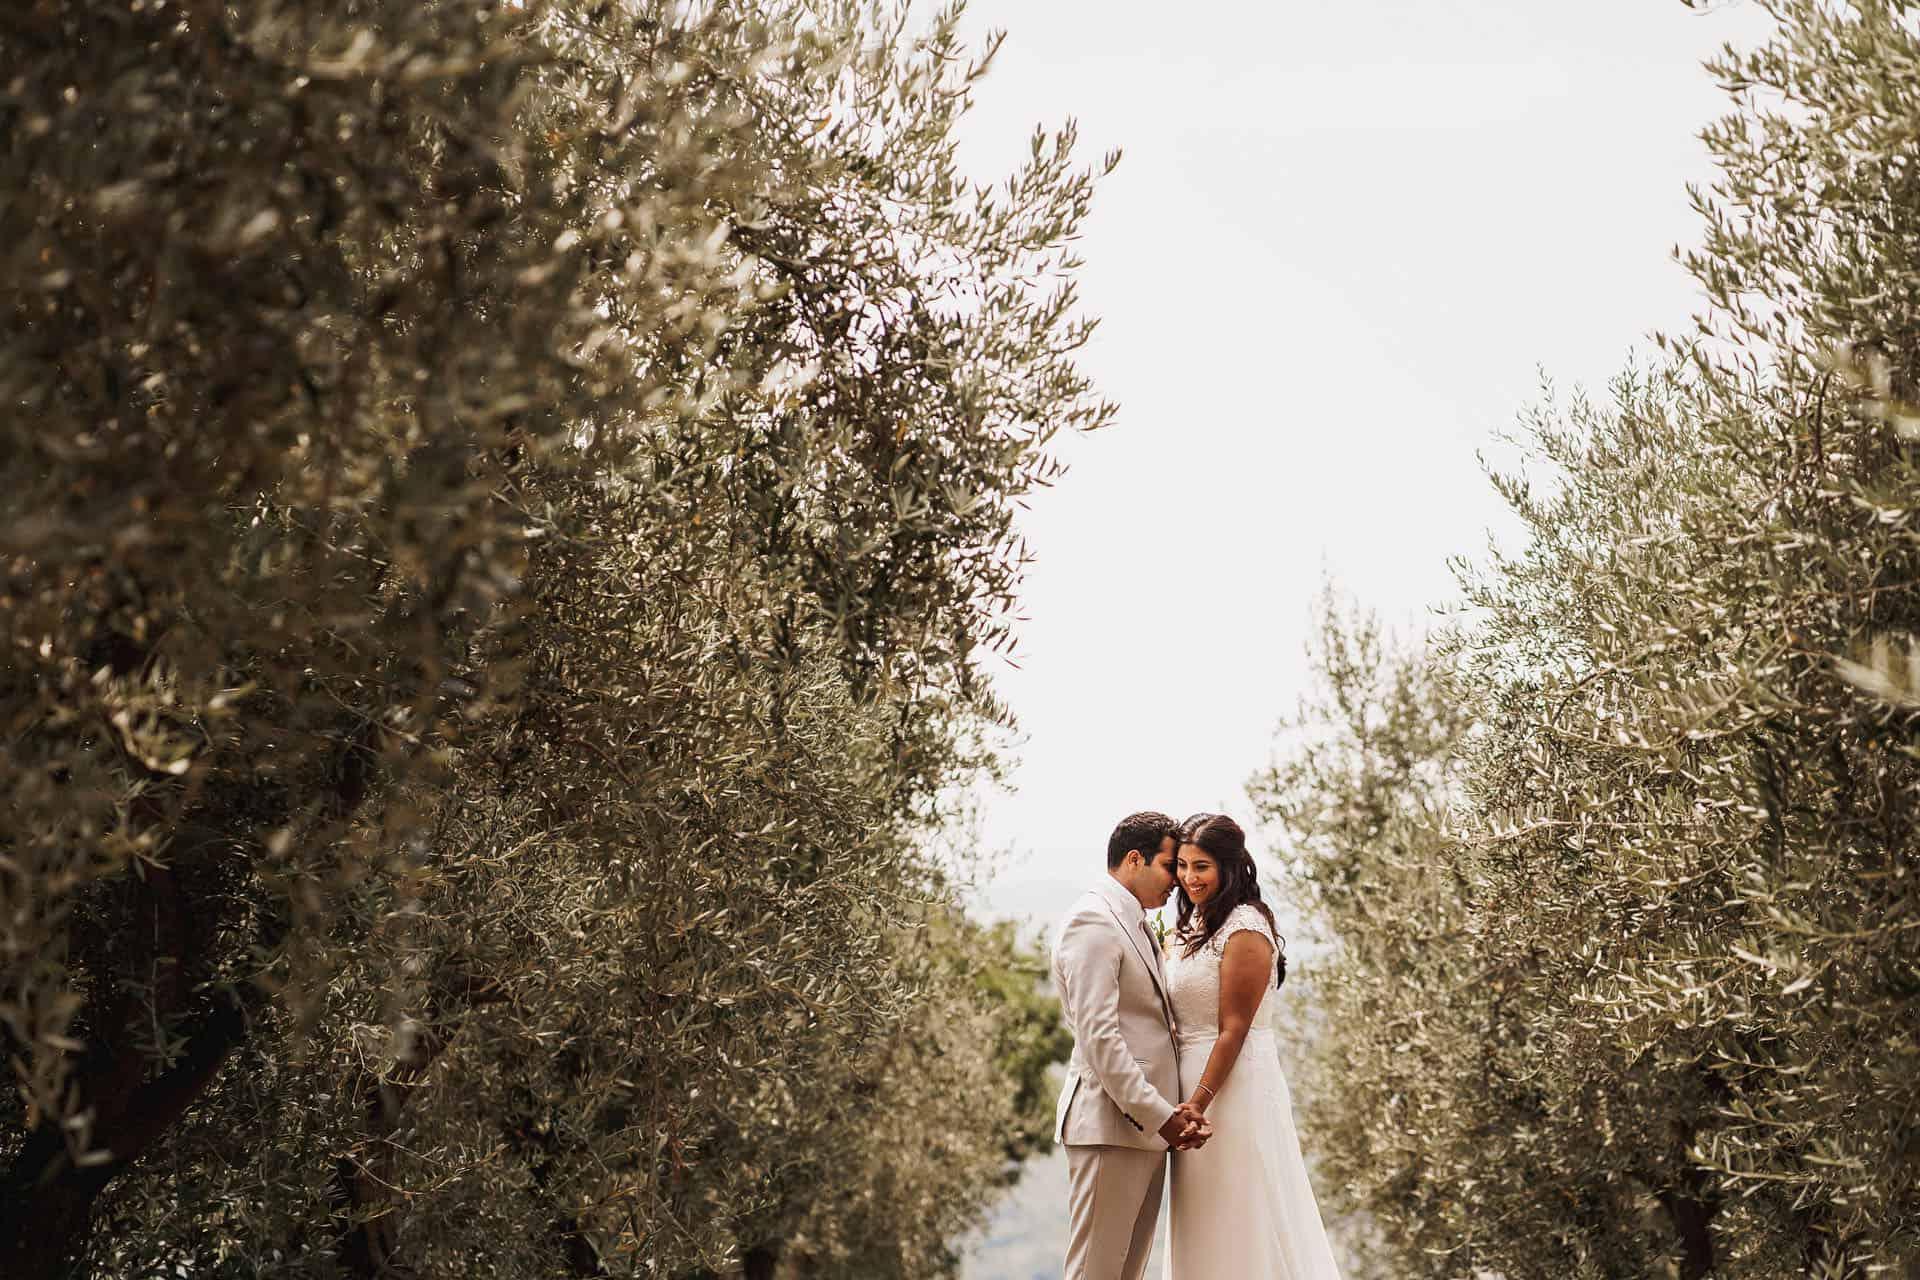 tenuta di artimino wedding tuscany